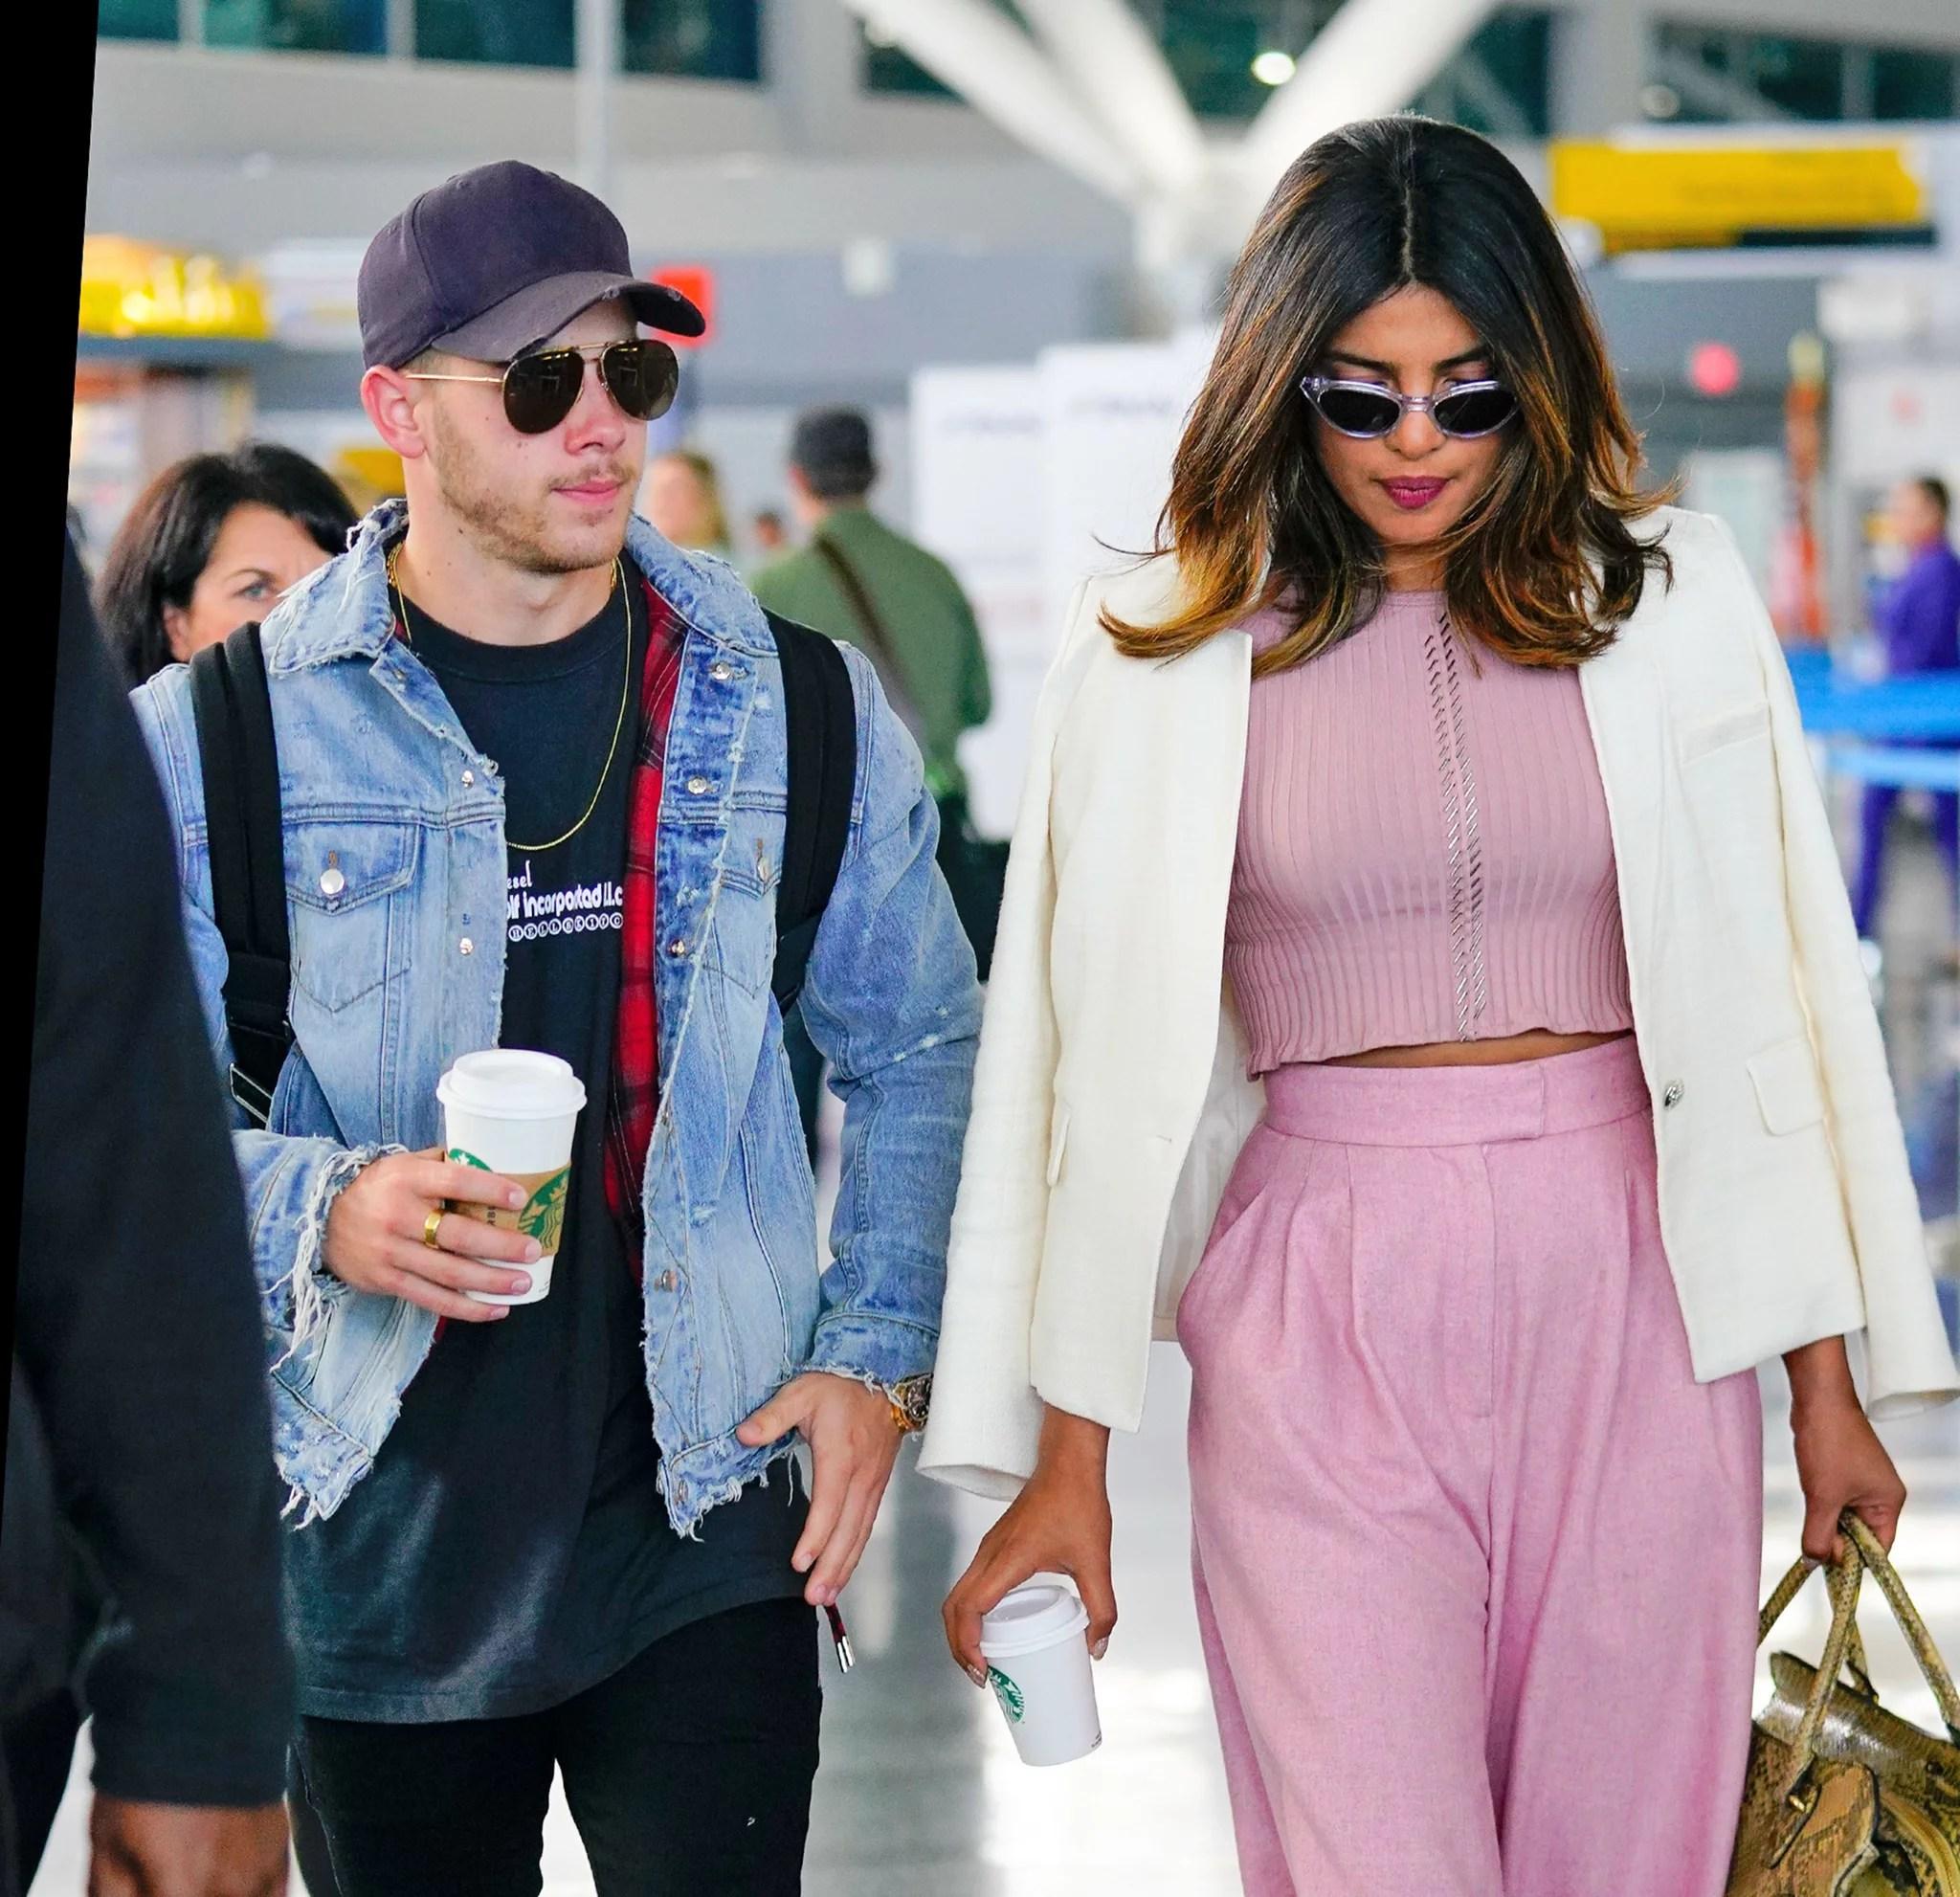 How Old Are Nick Jonas And Priyanka Chopra Popsugar Celebrity Australia